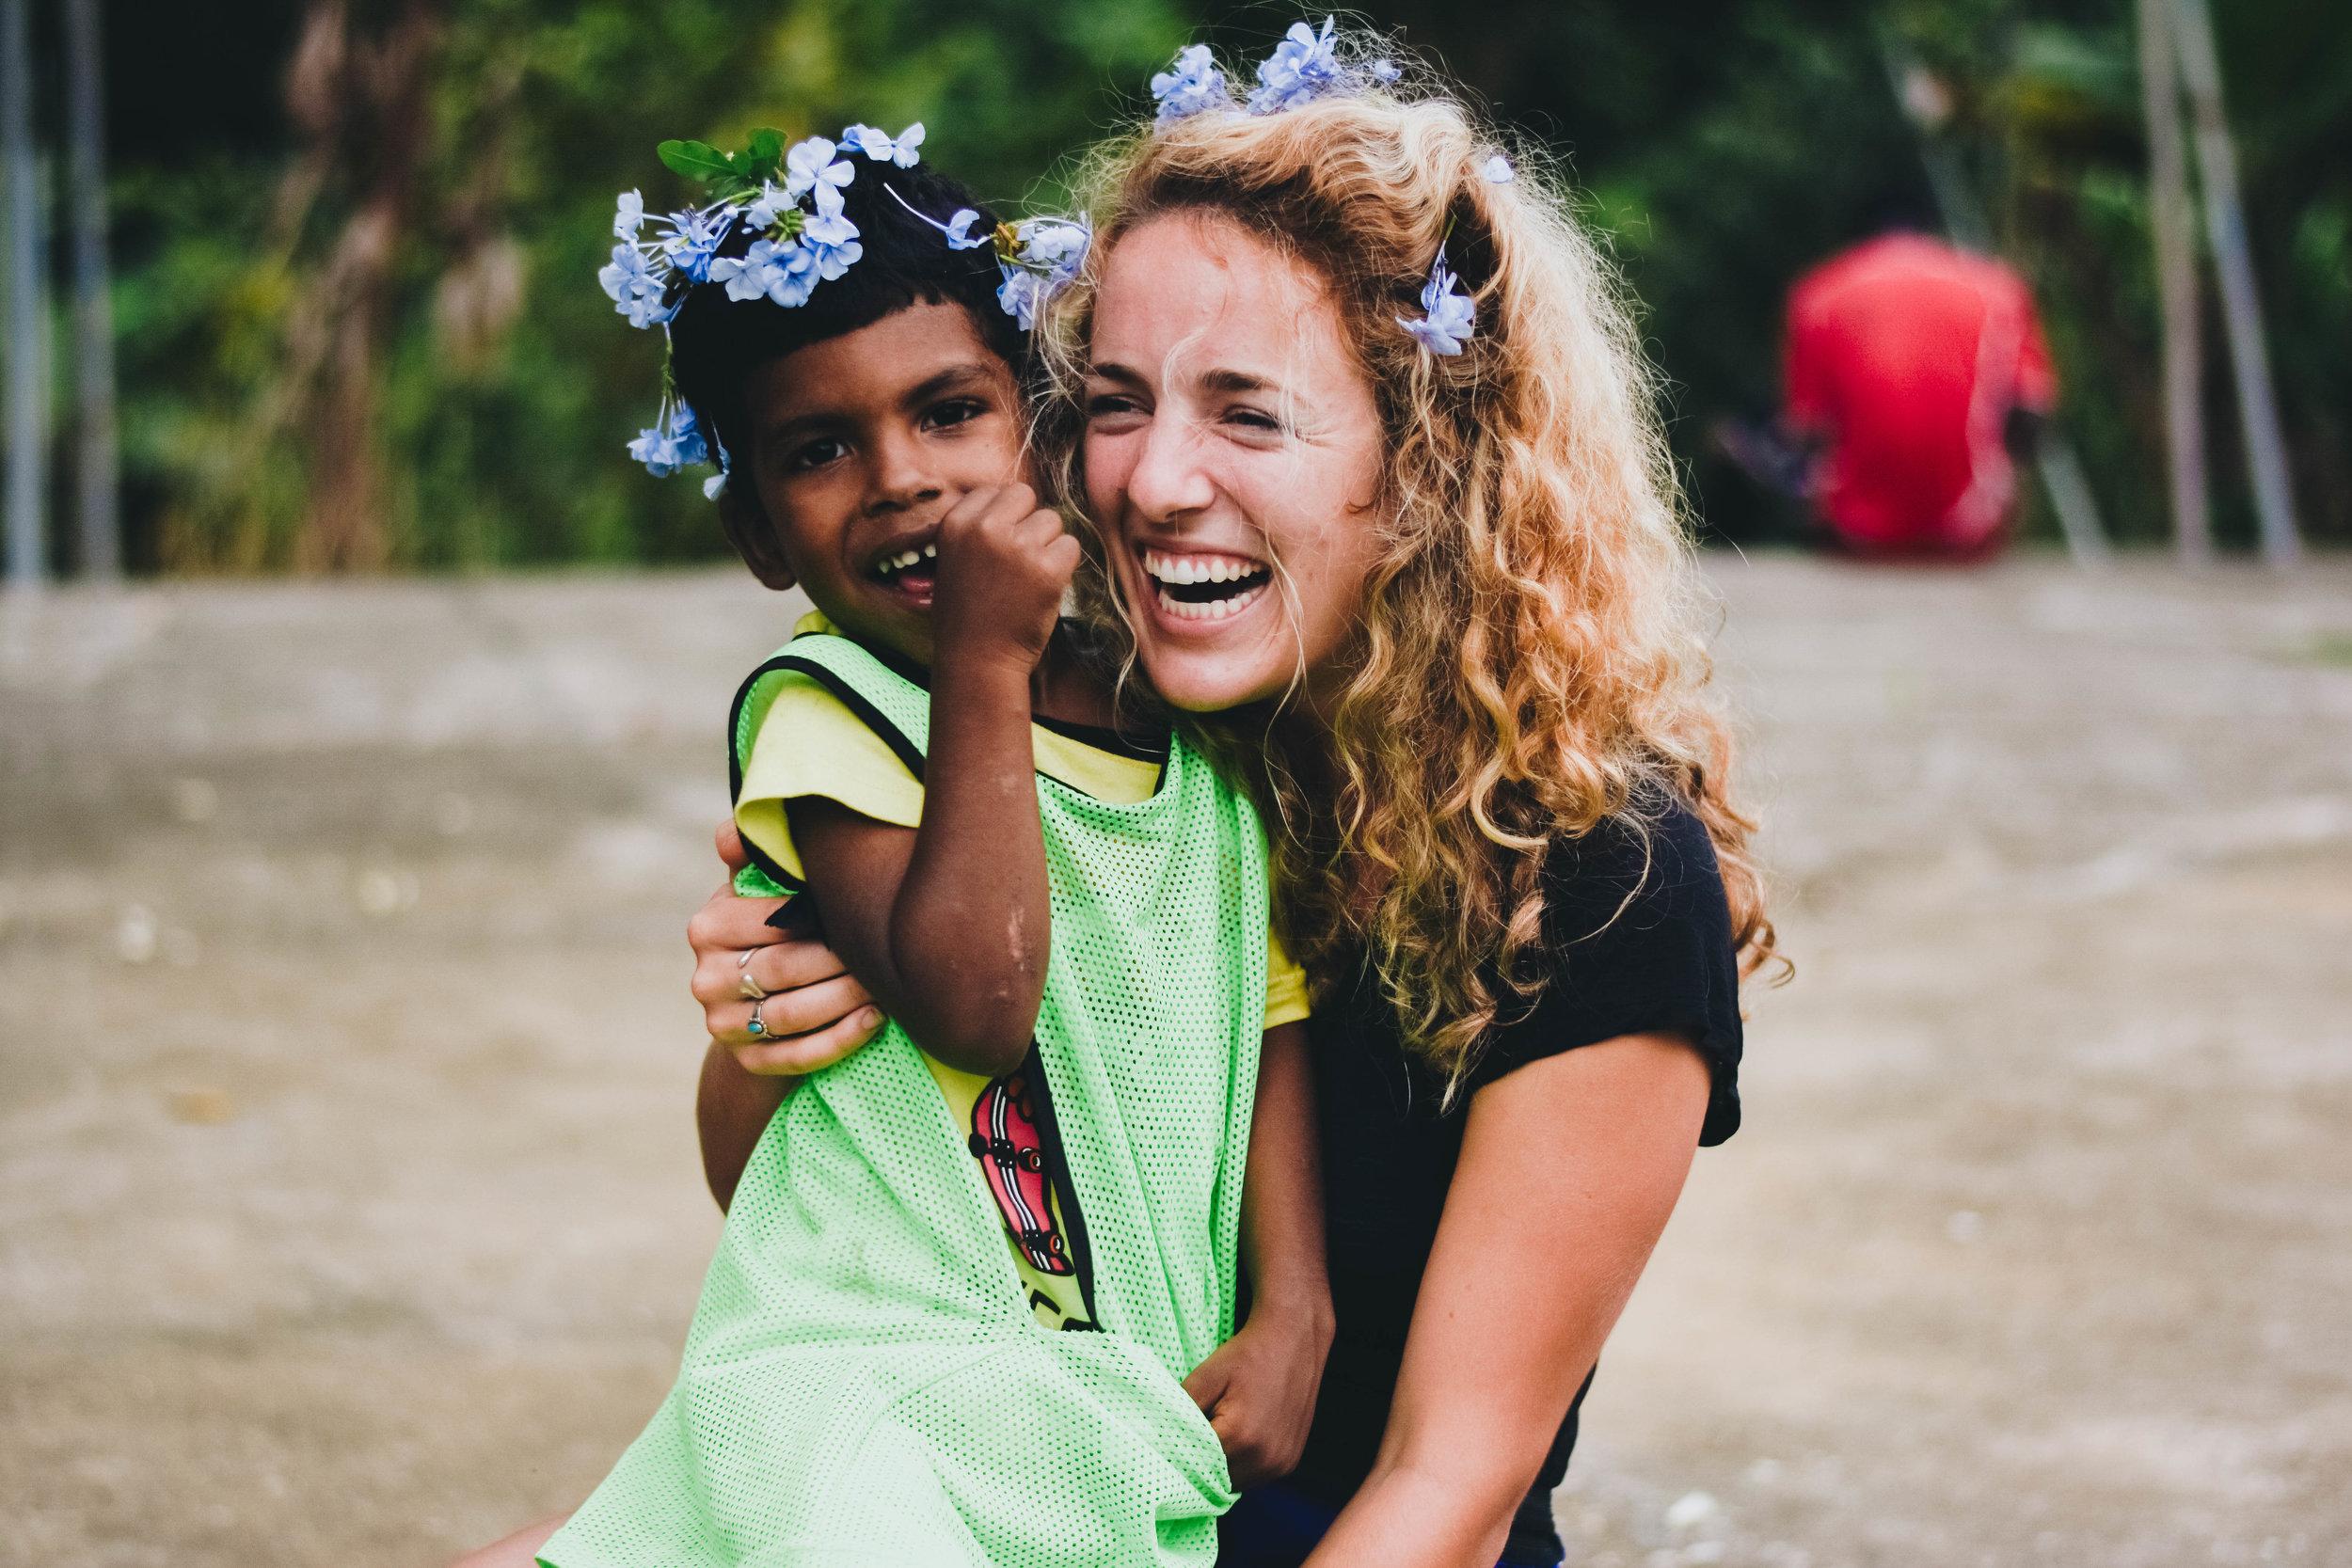 Sweet Sammy | Jarabacoa, Dominican Republic | May 2016